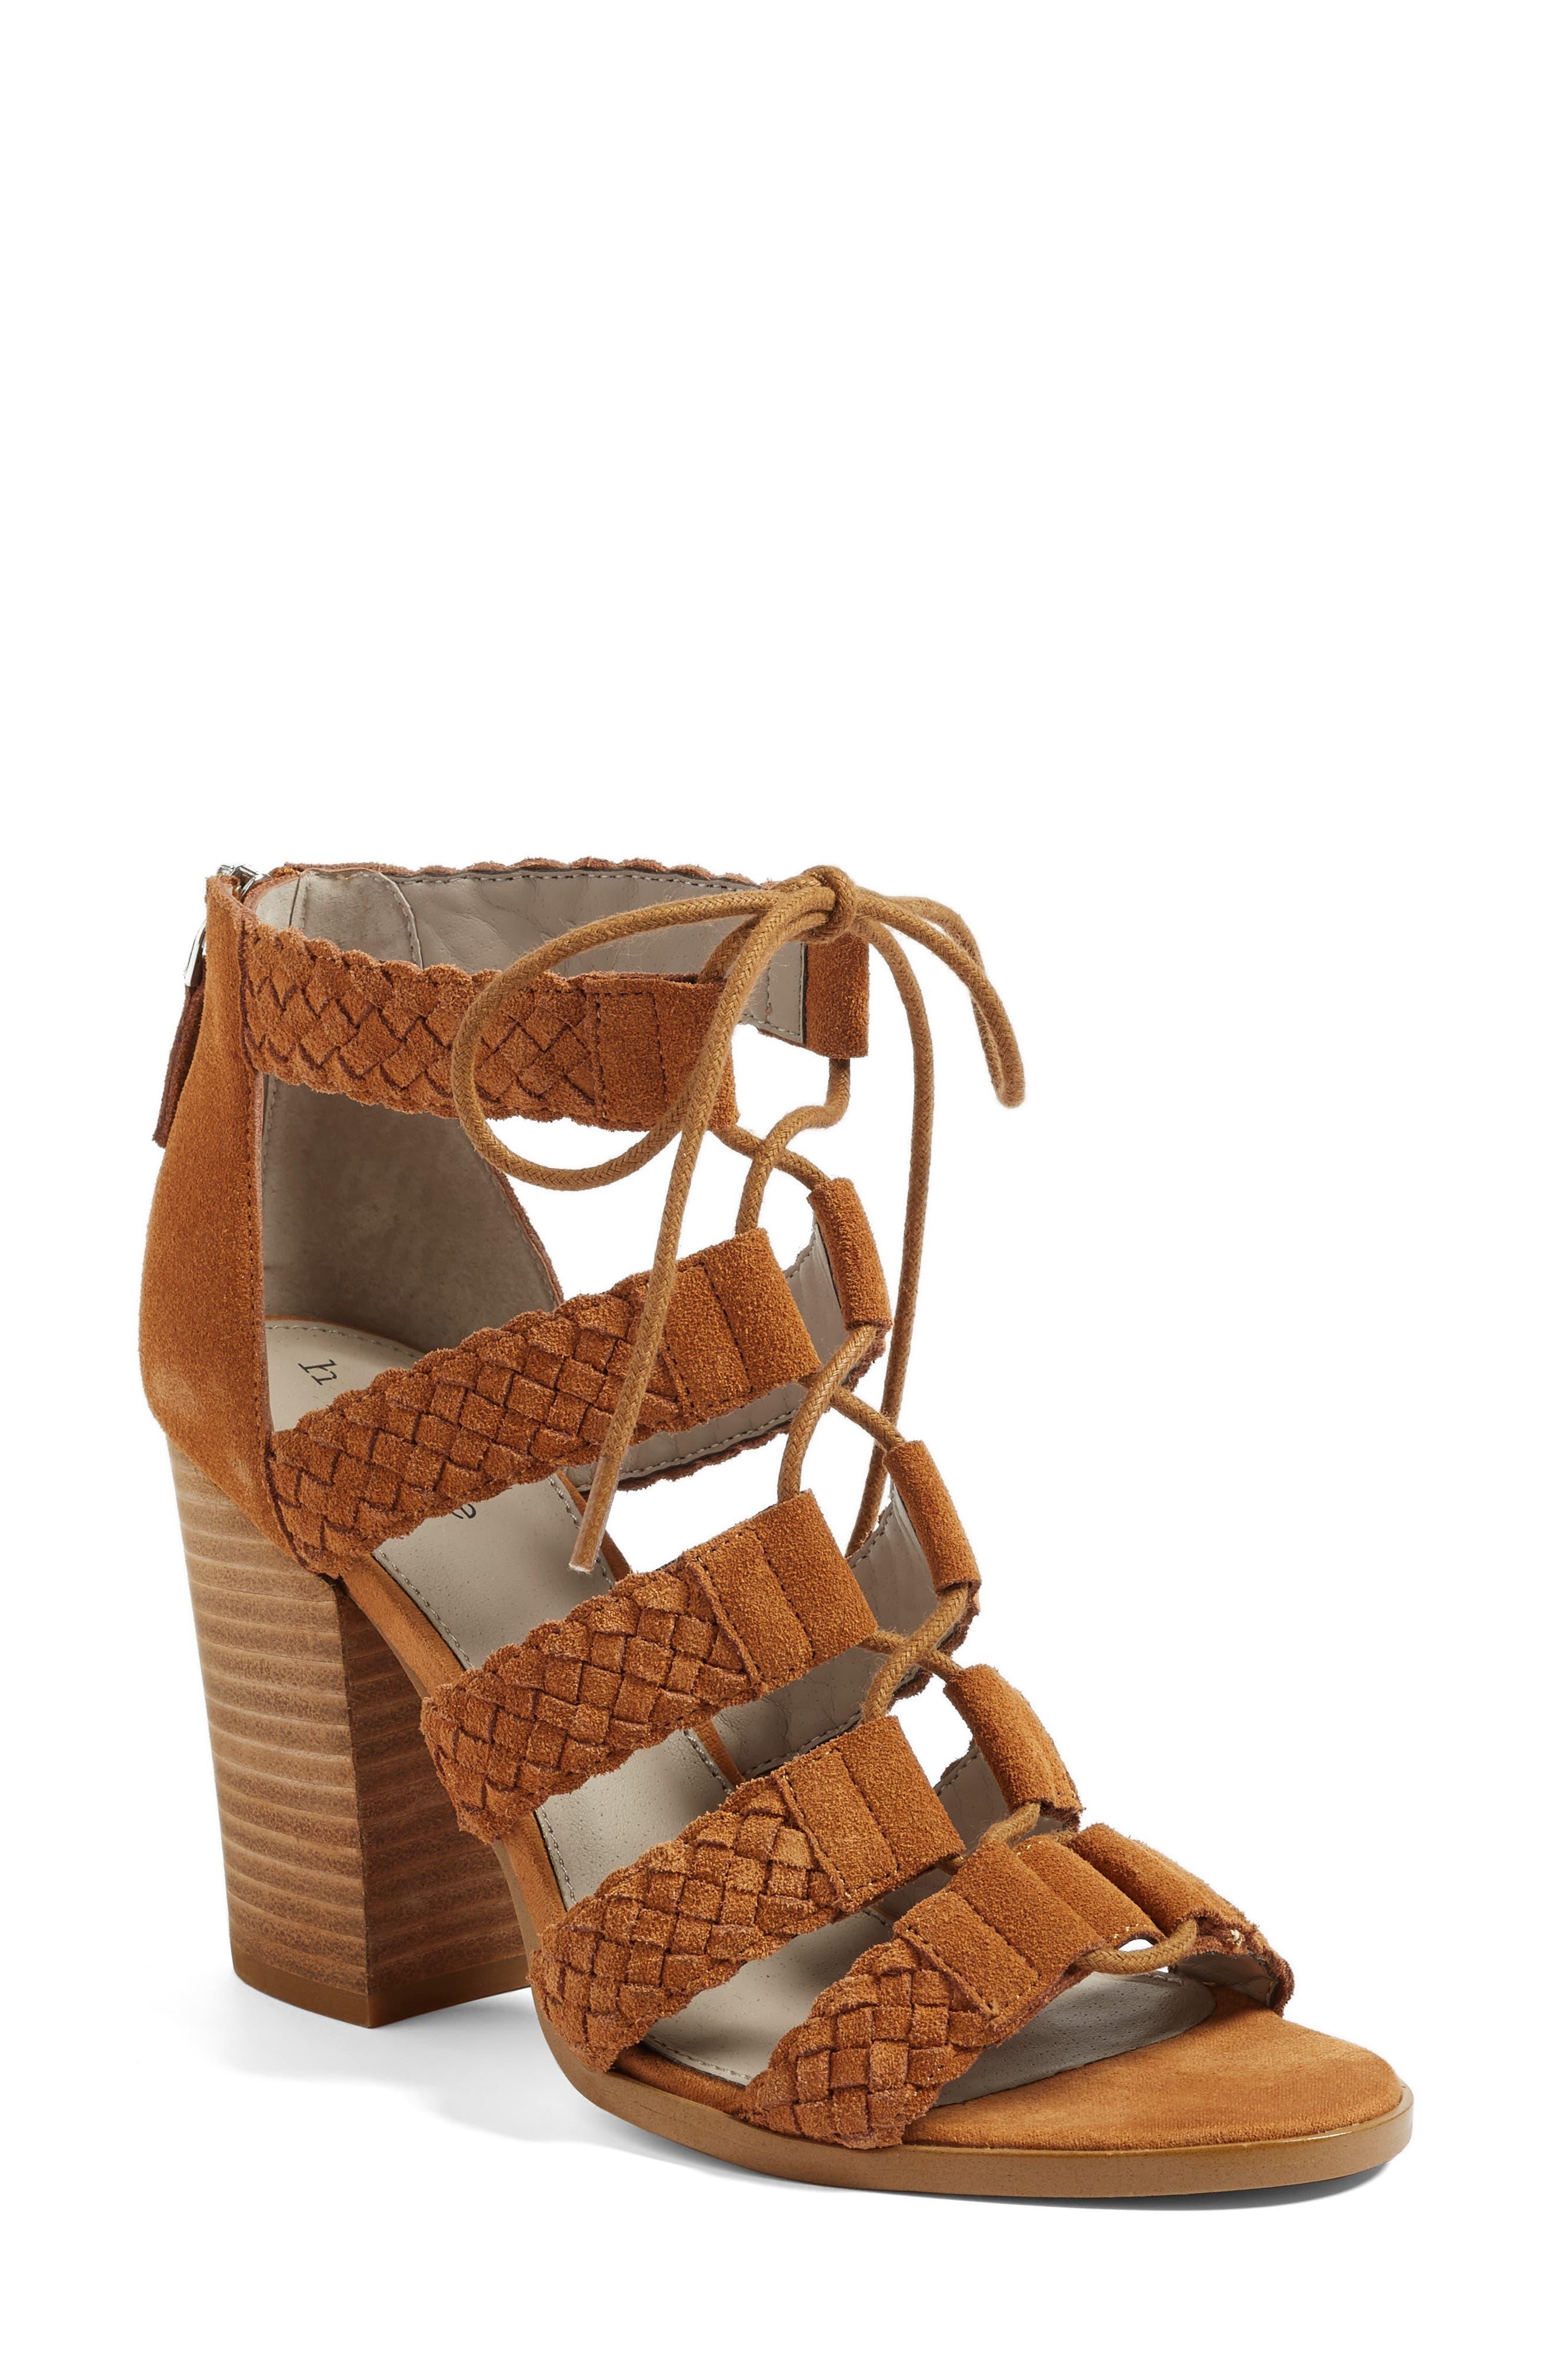 Desi Block Heel Sandal,                             Main thumbnail 1, color,                             202